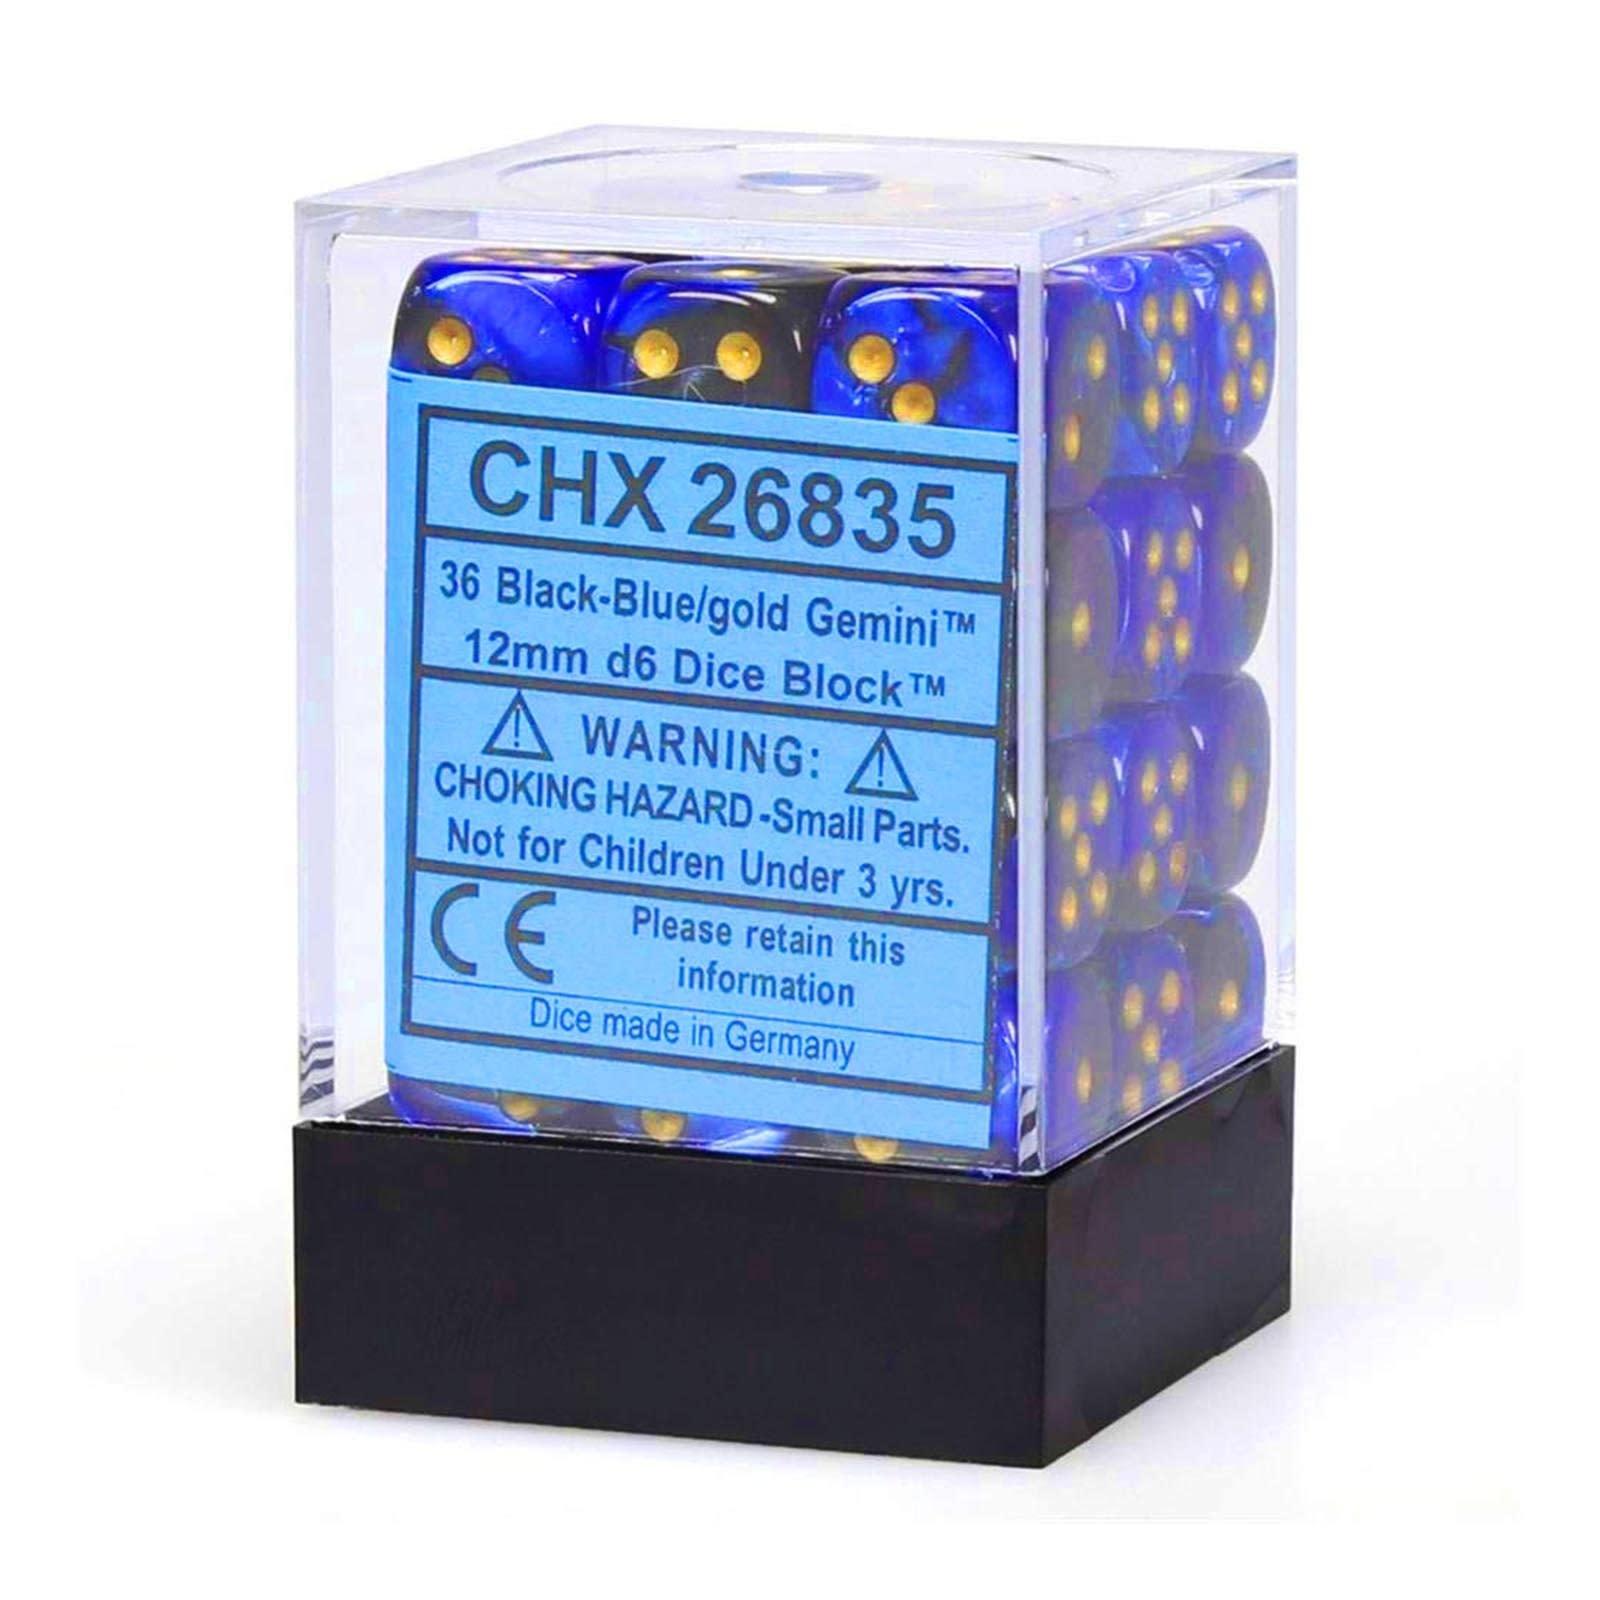 Chessex Chessex Gemini Black-Blue/Gold Set of 36 D6 Dice